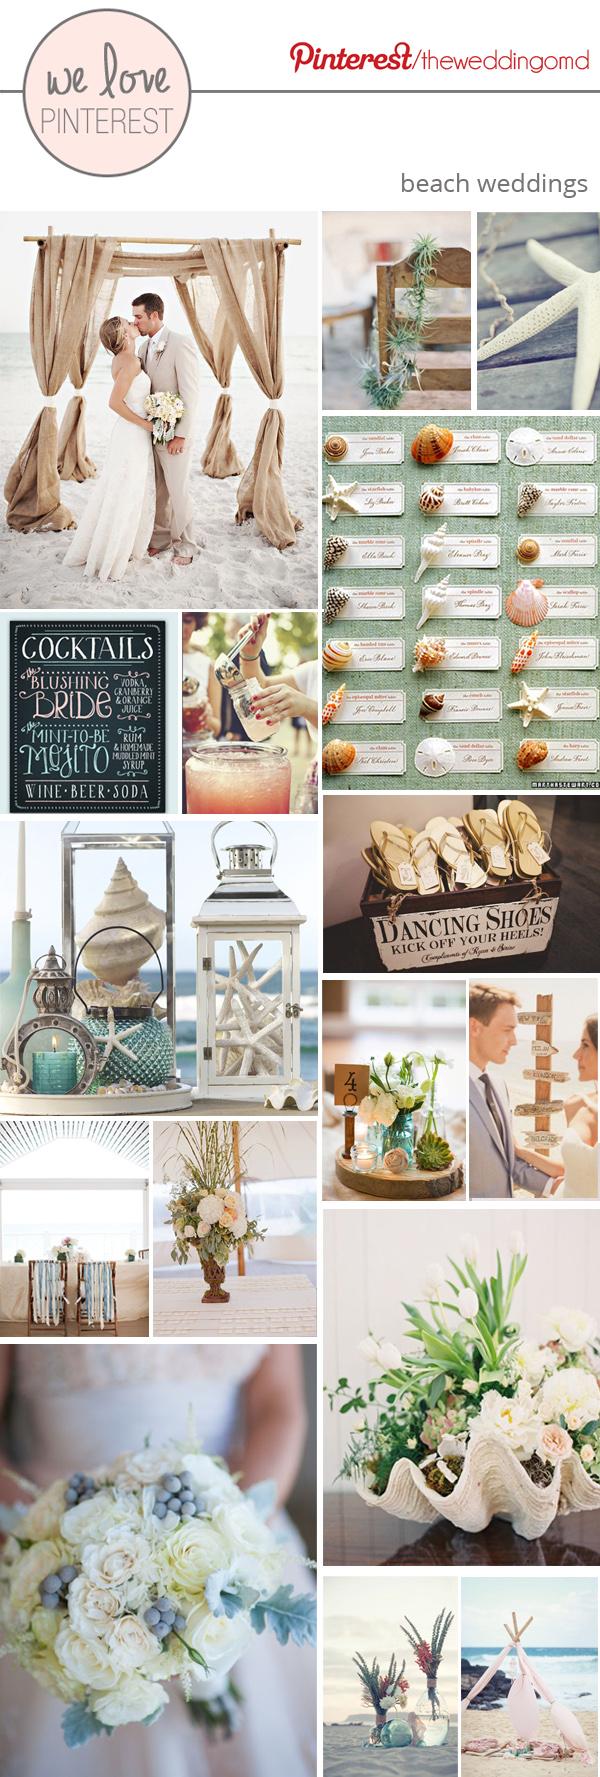 beach wedding ideas and inspiration